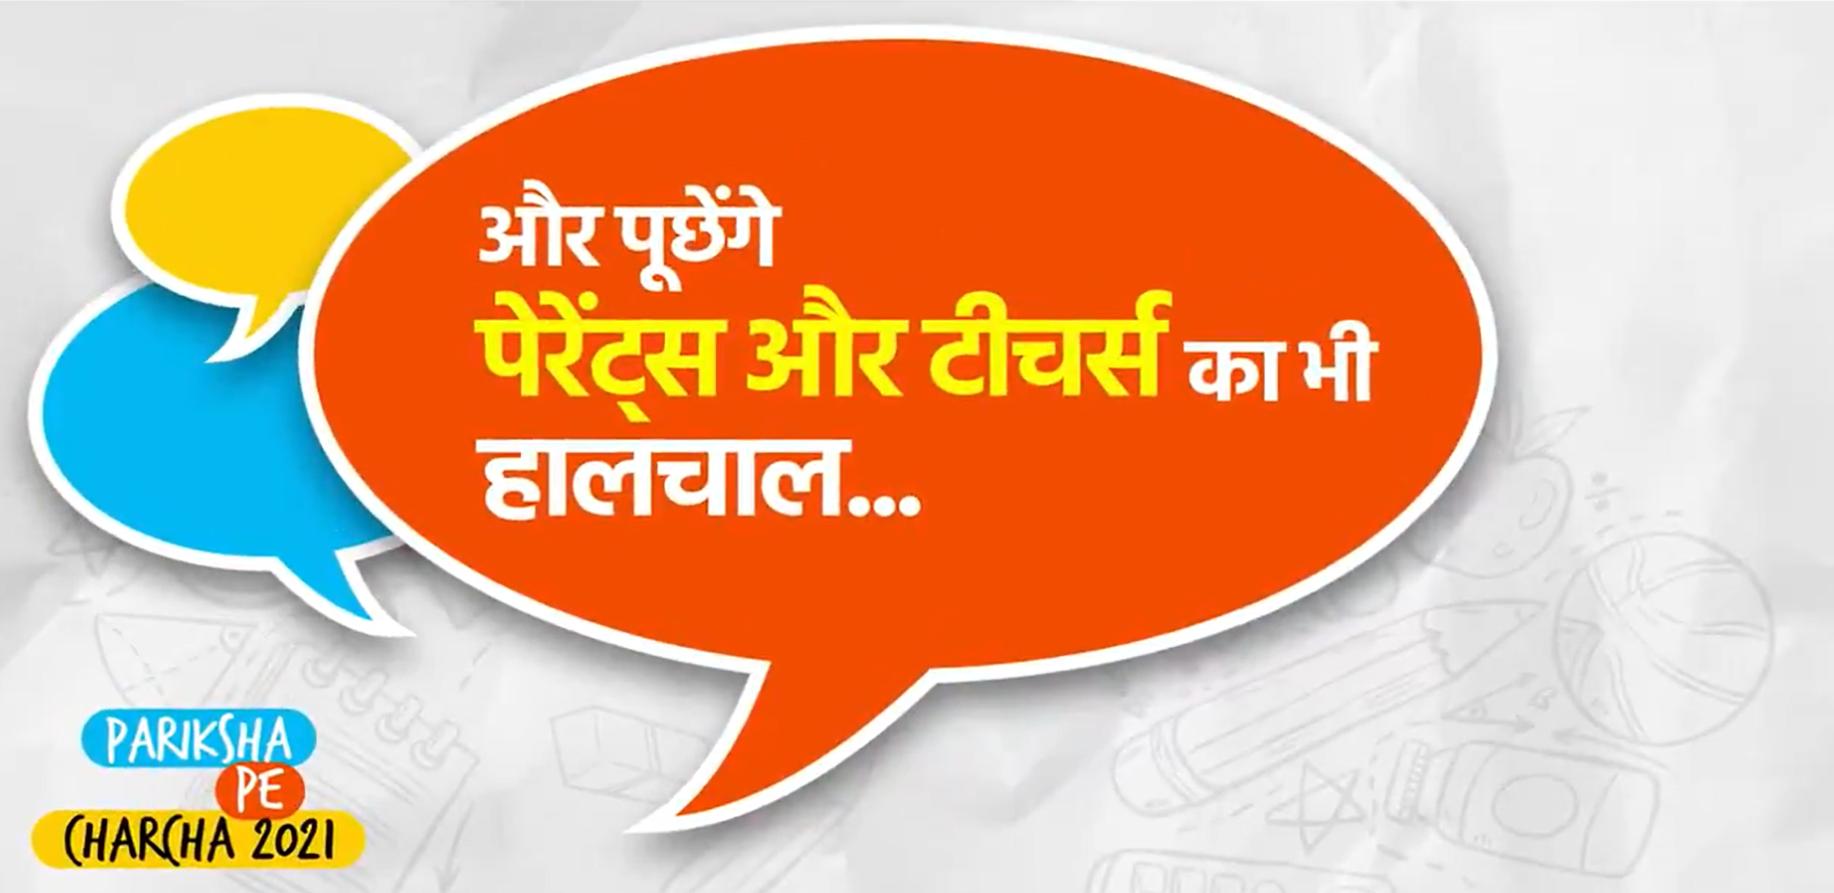 Pariksha Pe Charcha 2021: PM Modi Mantras for Students_60.1